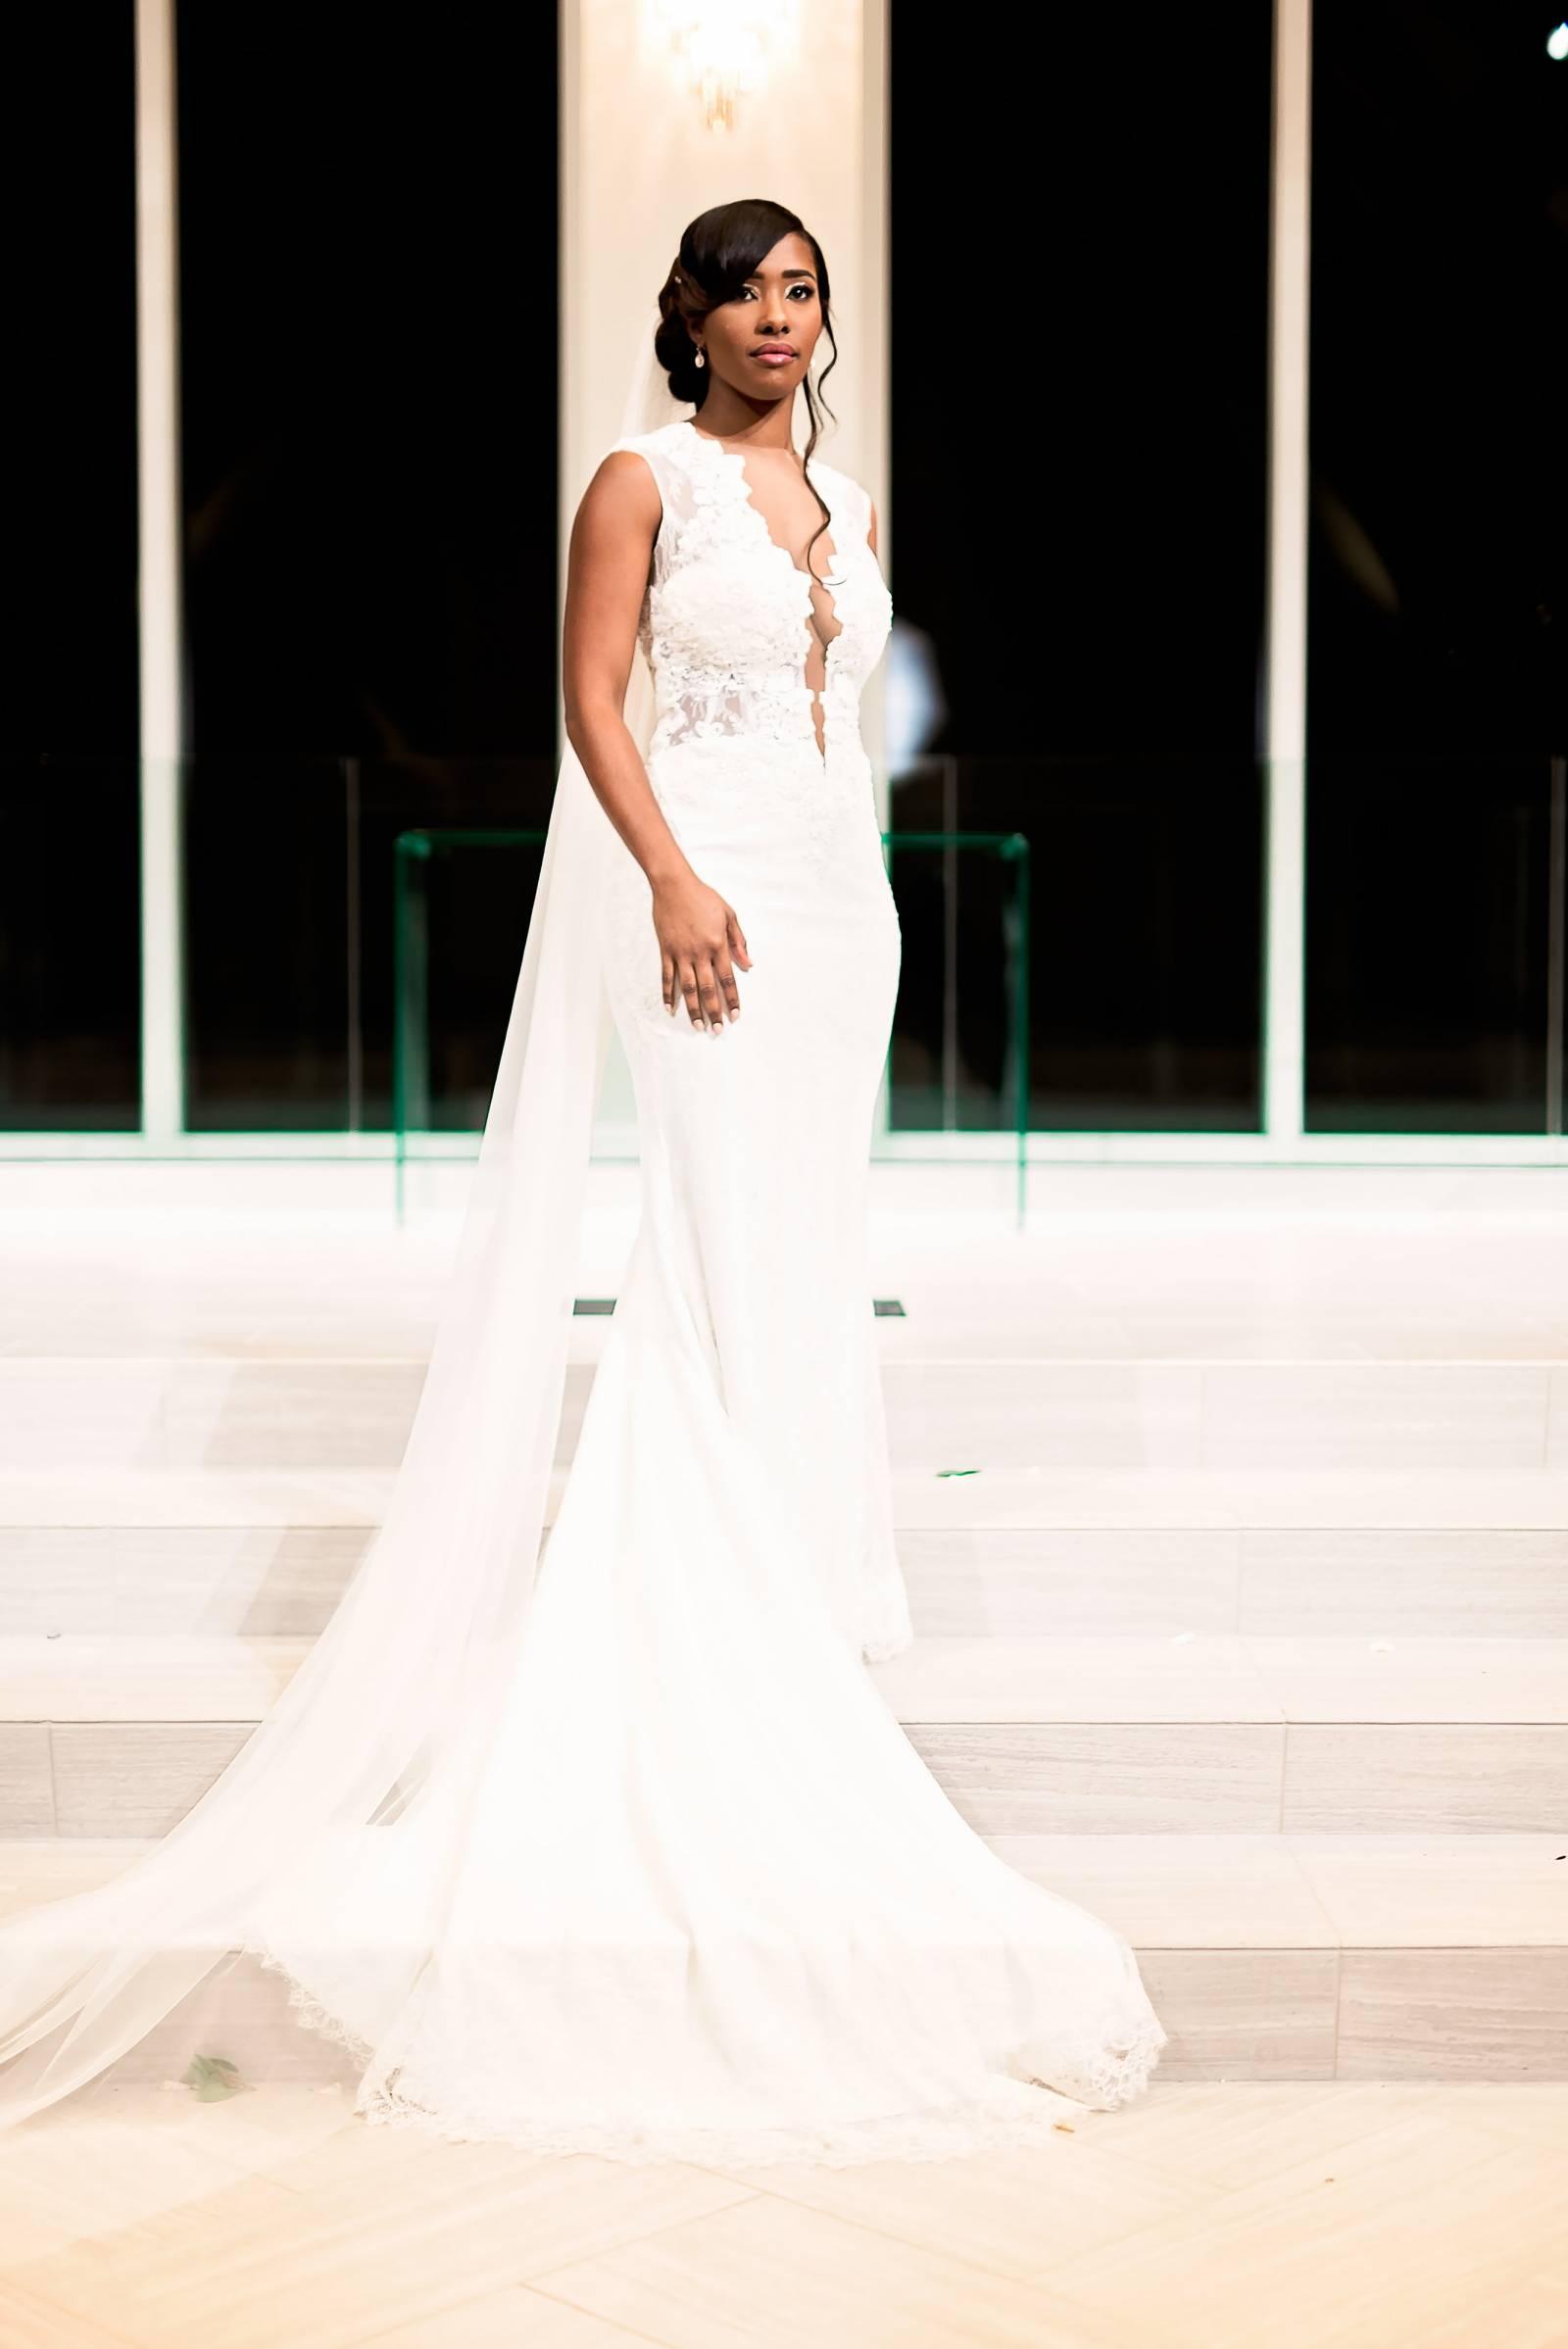 DeShana + Darryl Featured on the Black Bride - 2.0 - 4.jpg